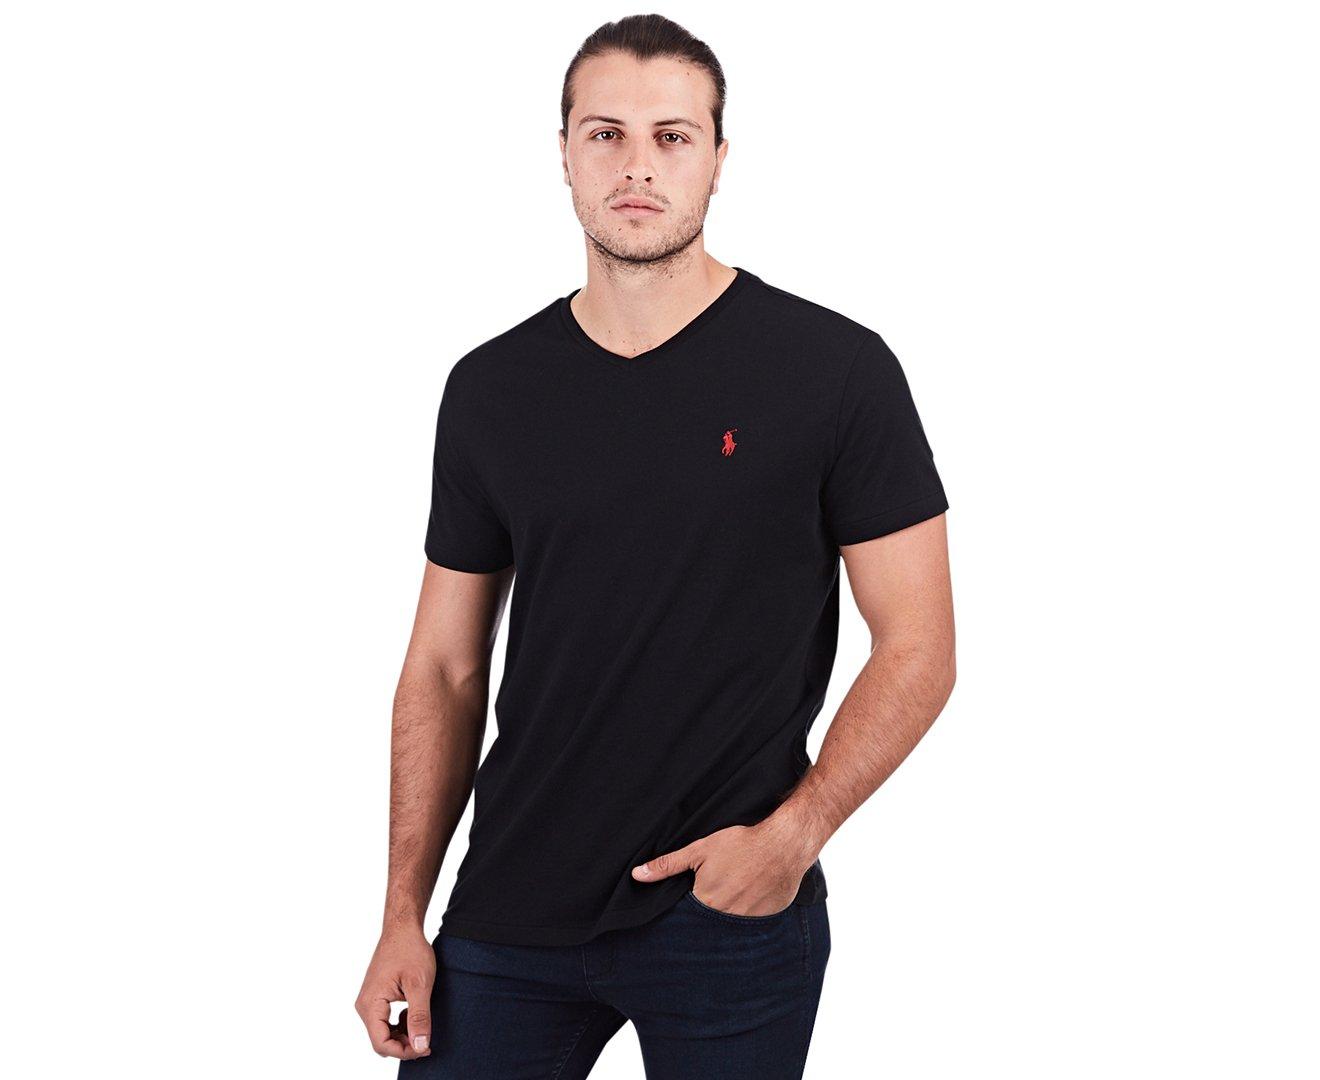 Polo Ralph Lauren Men's Classic Fit V-neck T-shirt (Large, RL Black) by Polo Ralph Lauren